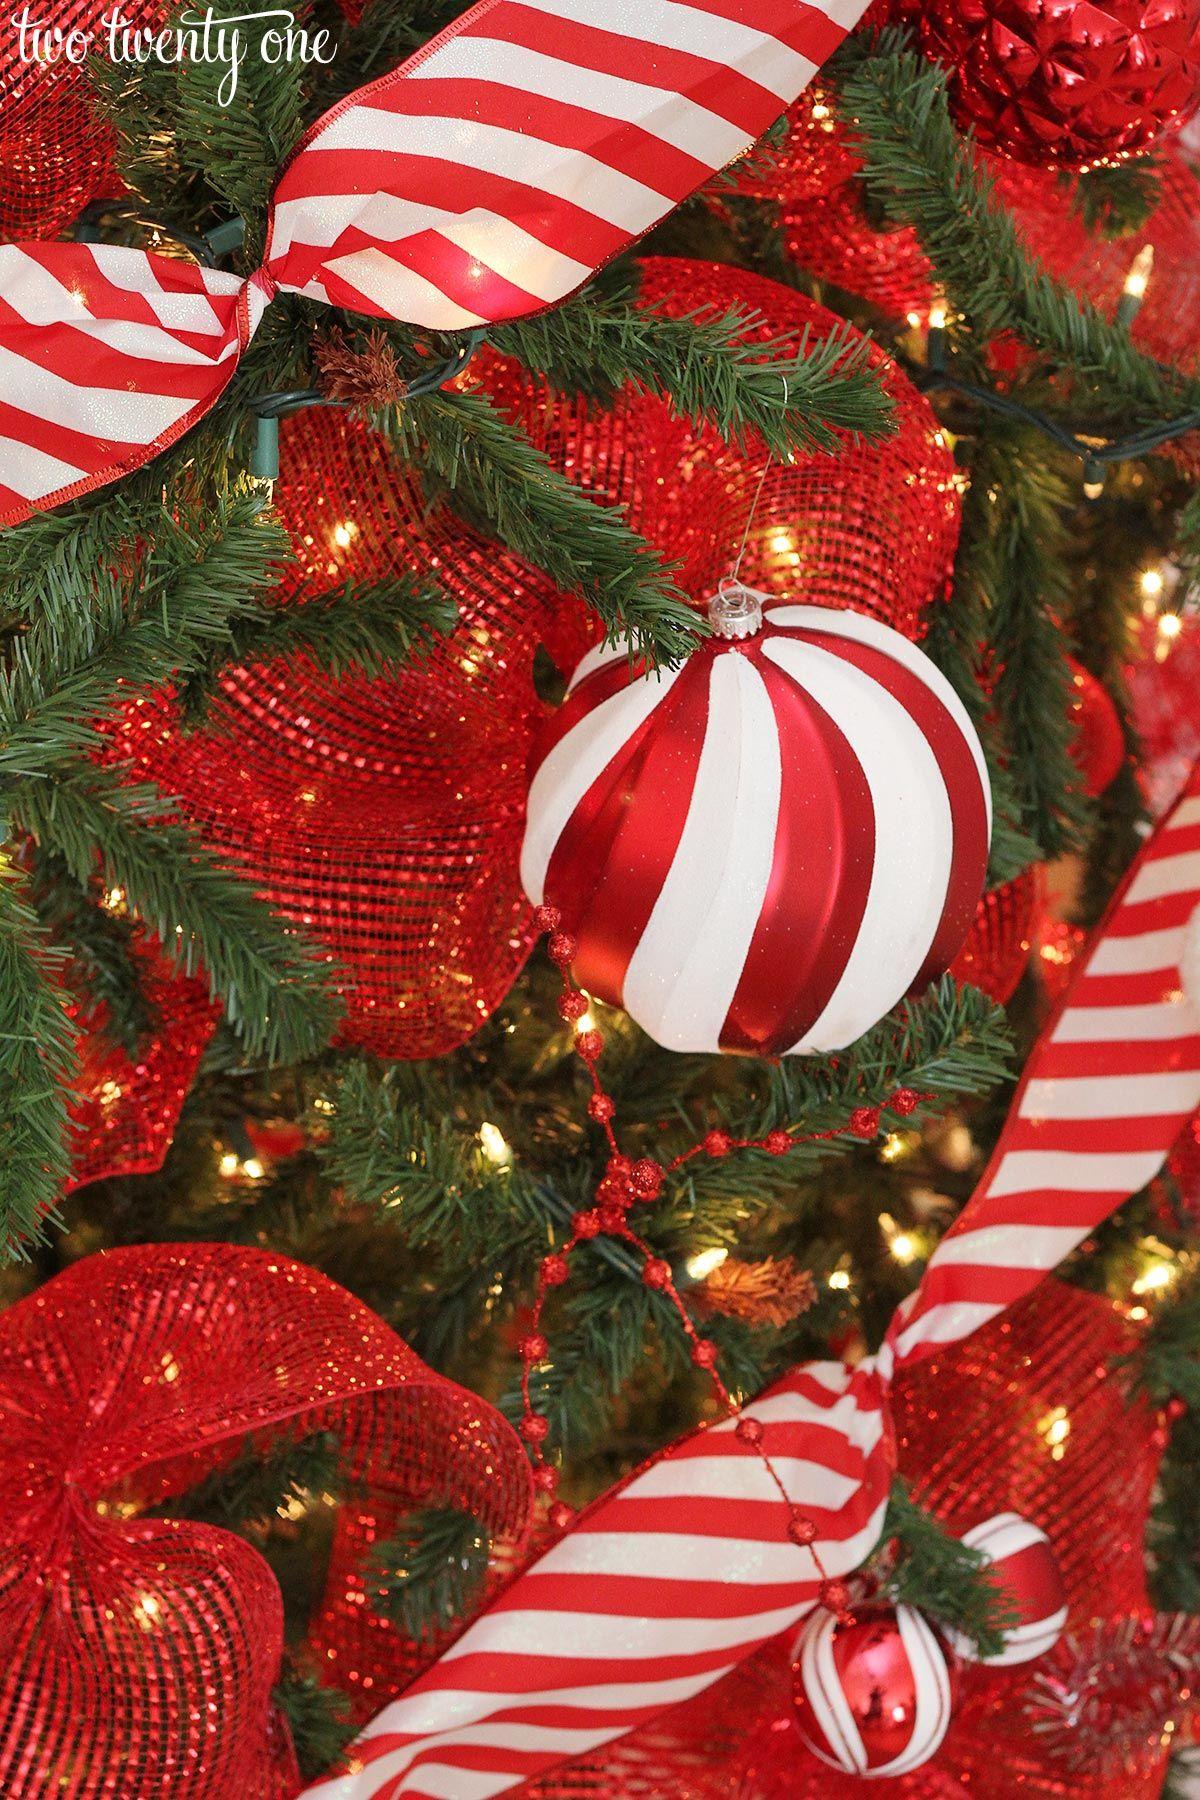 Red & White Christmas Tree Christmas 2016 Home Tours